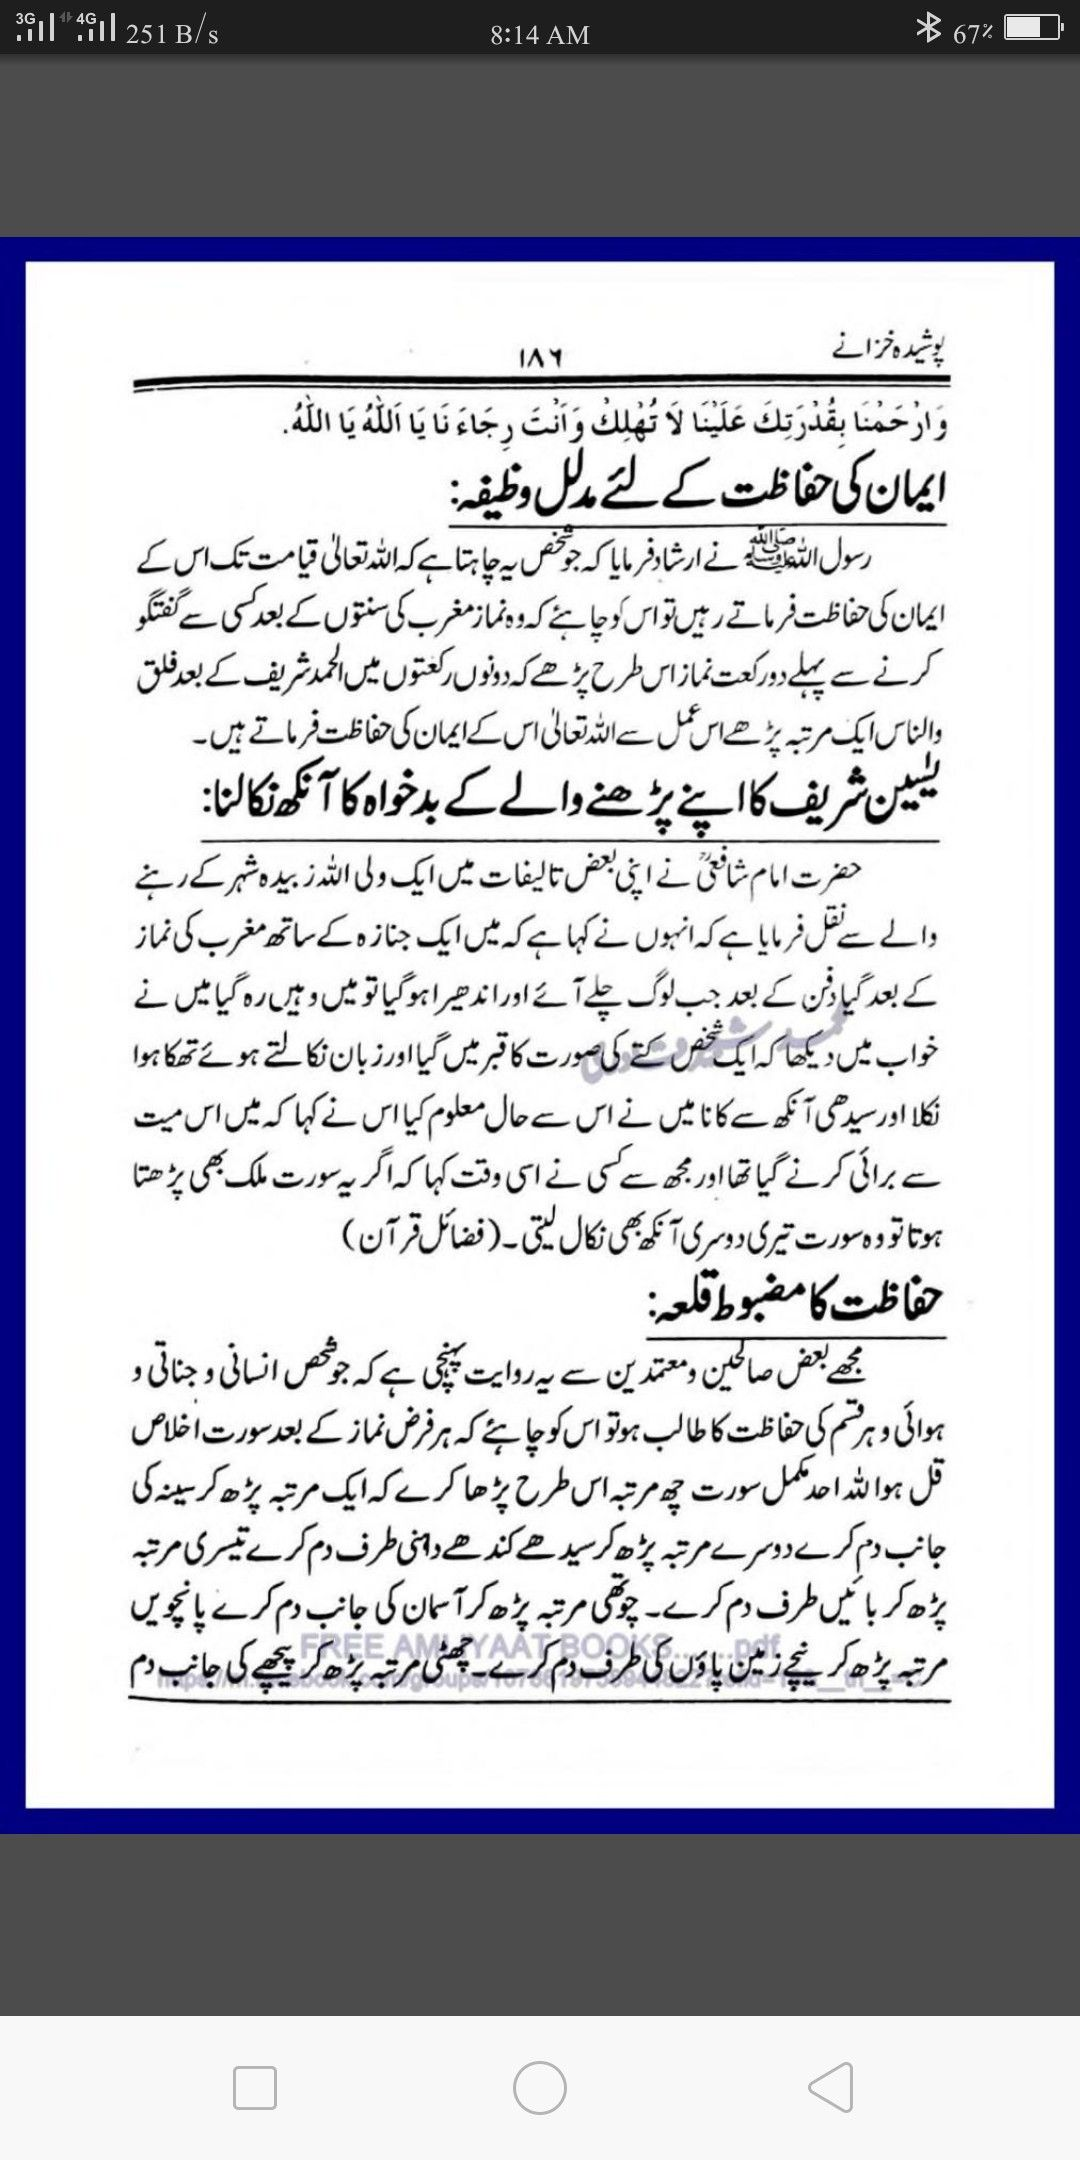 Pin on faree hisar /hifazat wazaif